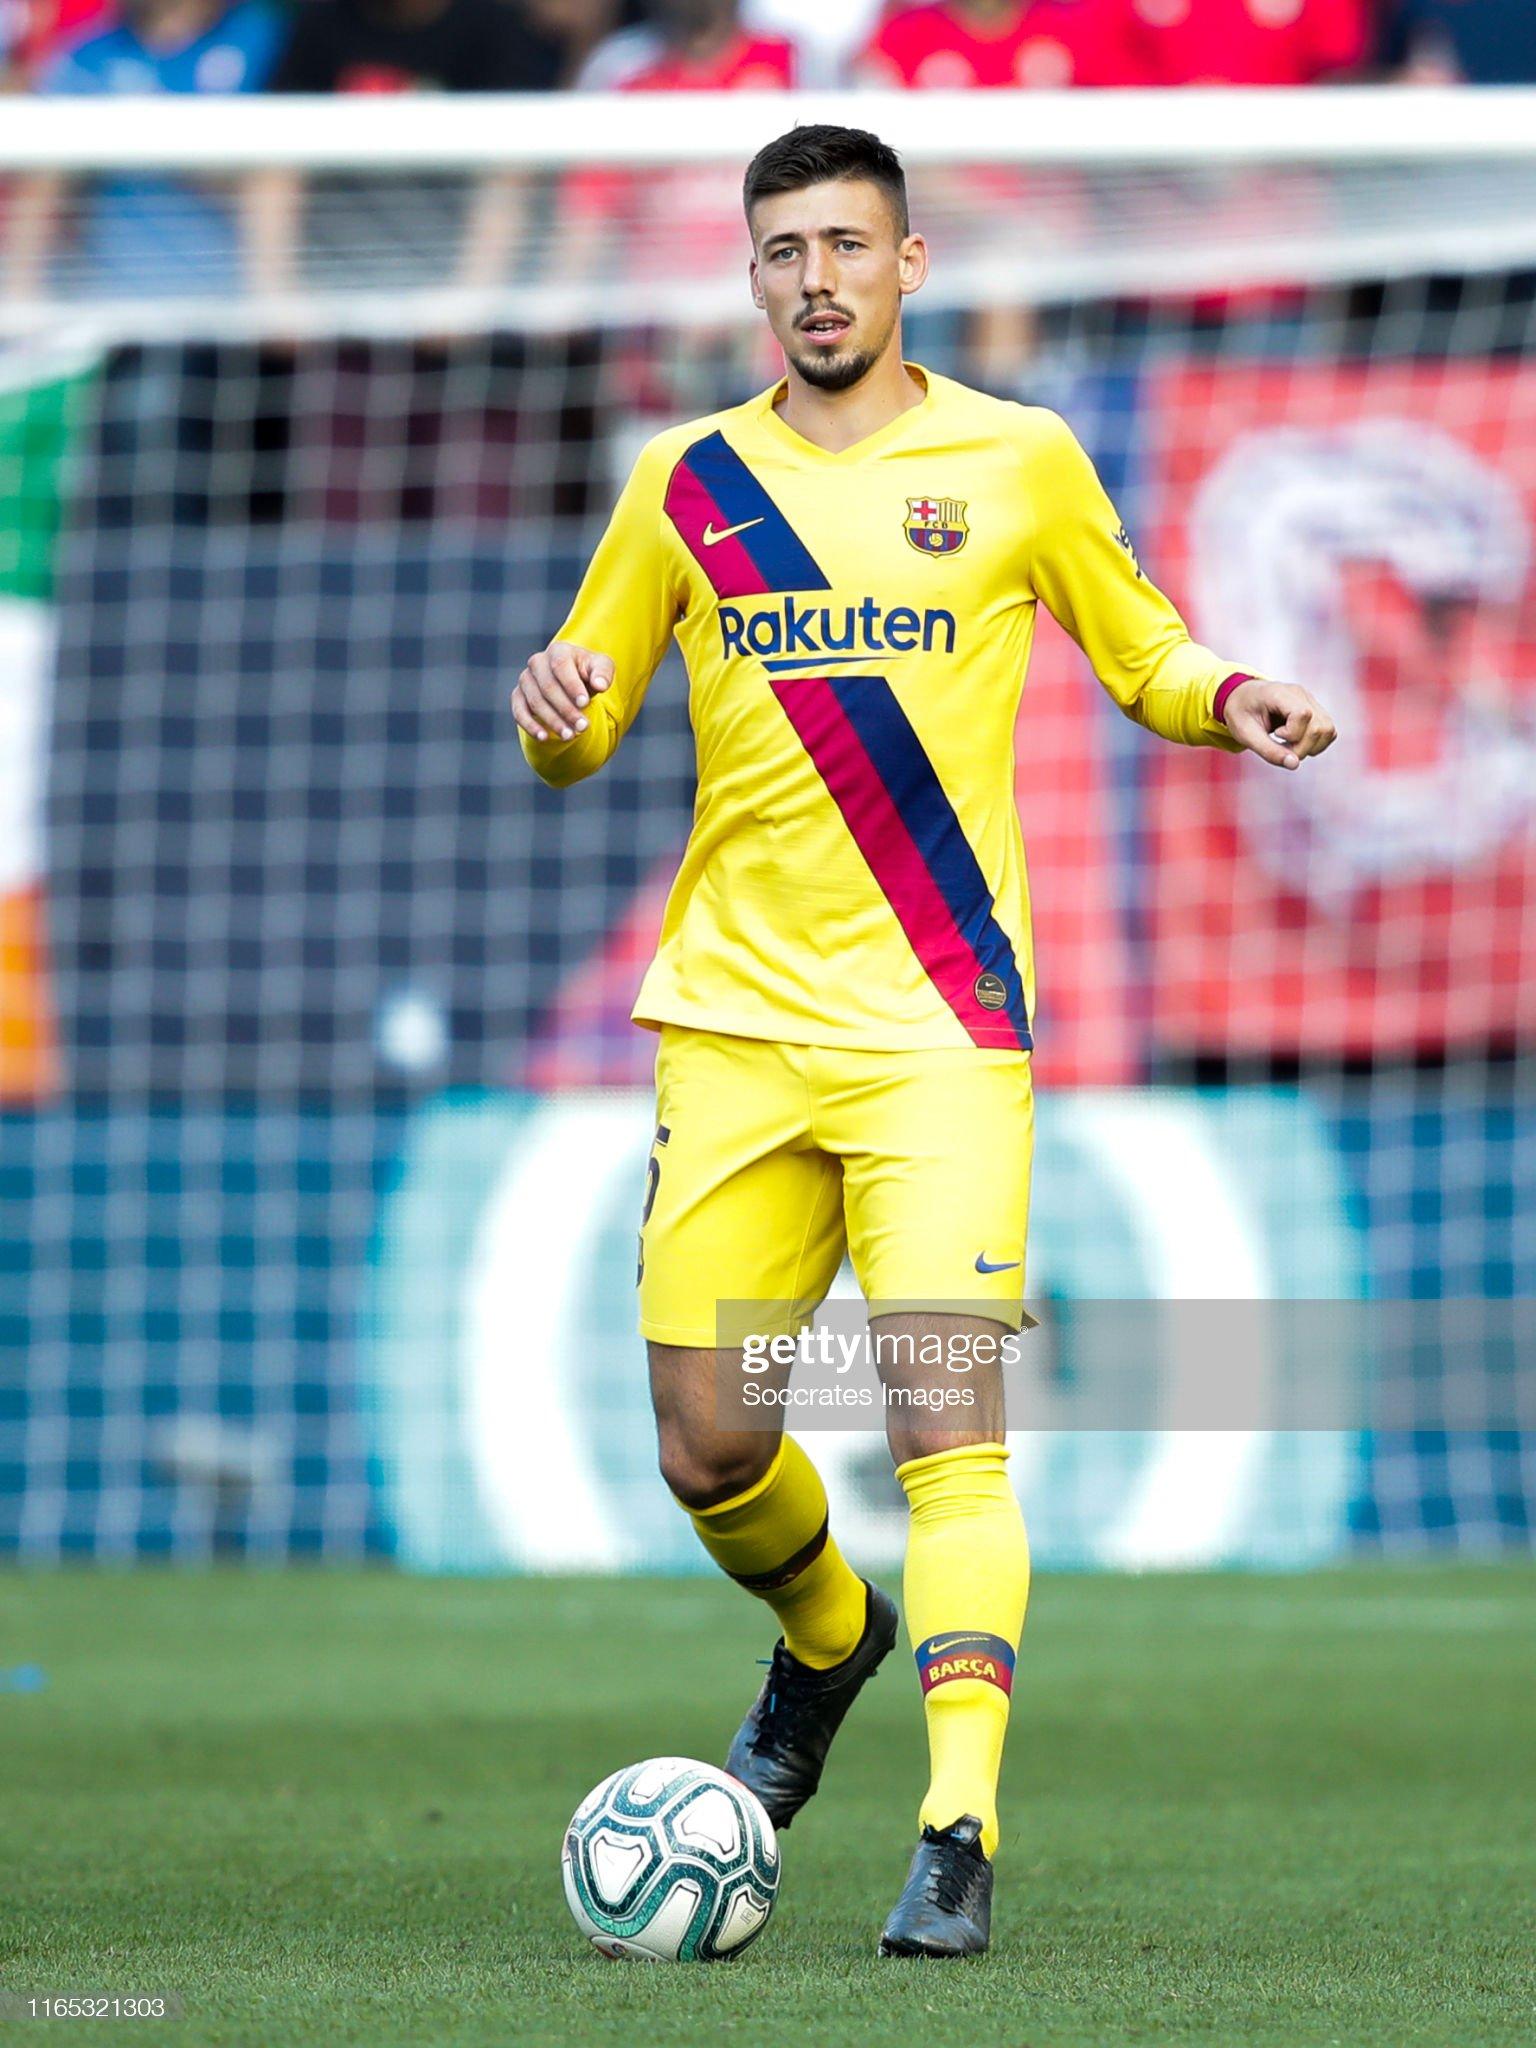 صور مباراة : أوساسونا - برشلونة 2-2 ( 31-08-2019 )  Clement-lenglet-of-fc-barcelona-during-the-la-liga-santander-match-picture-id1165321303?s=2048x2048